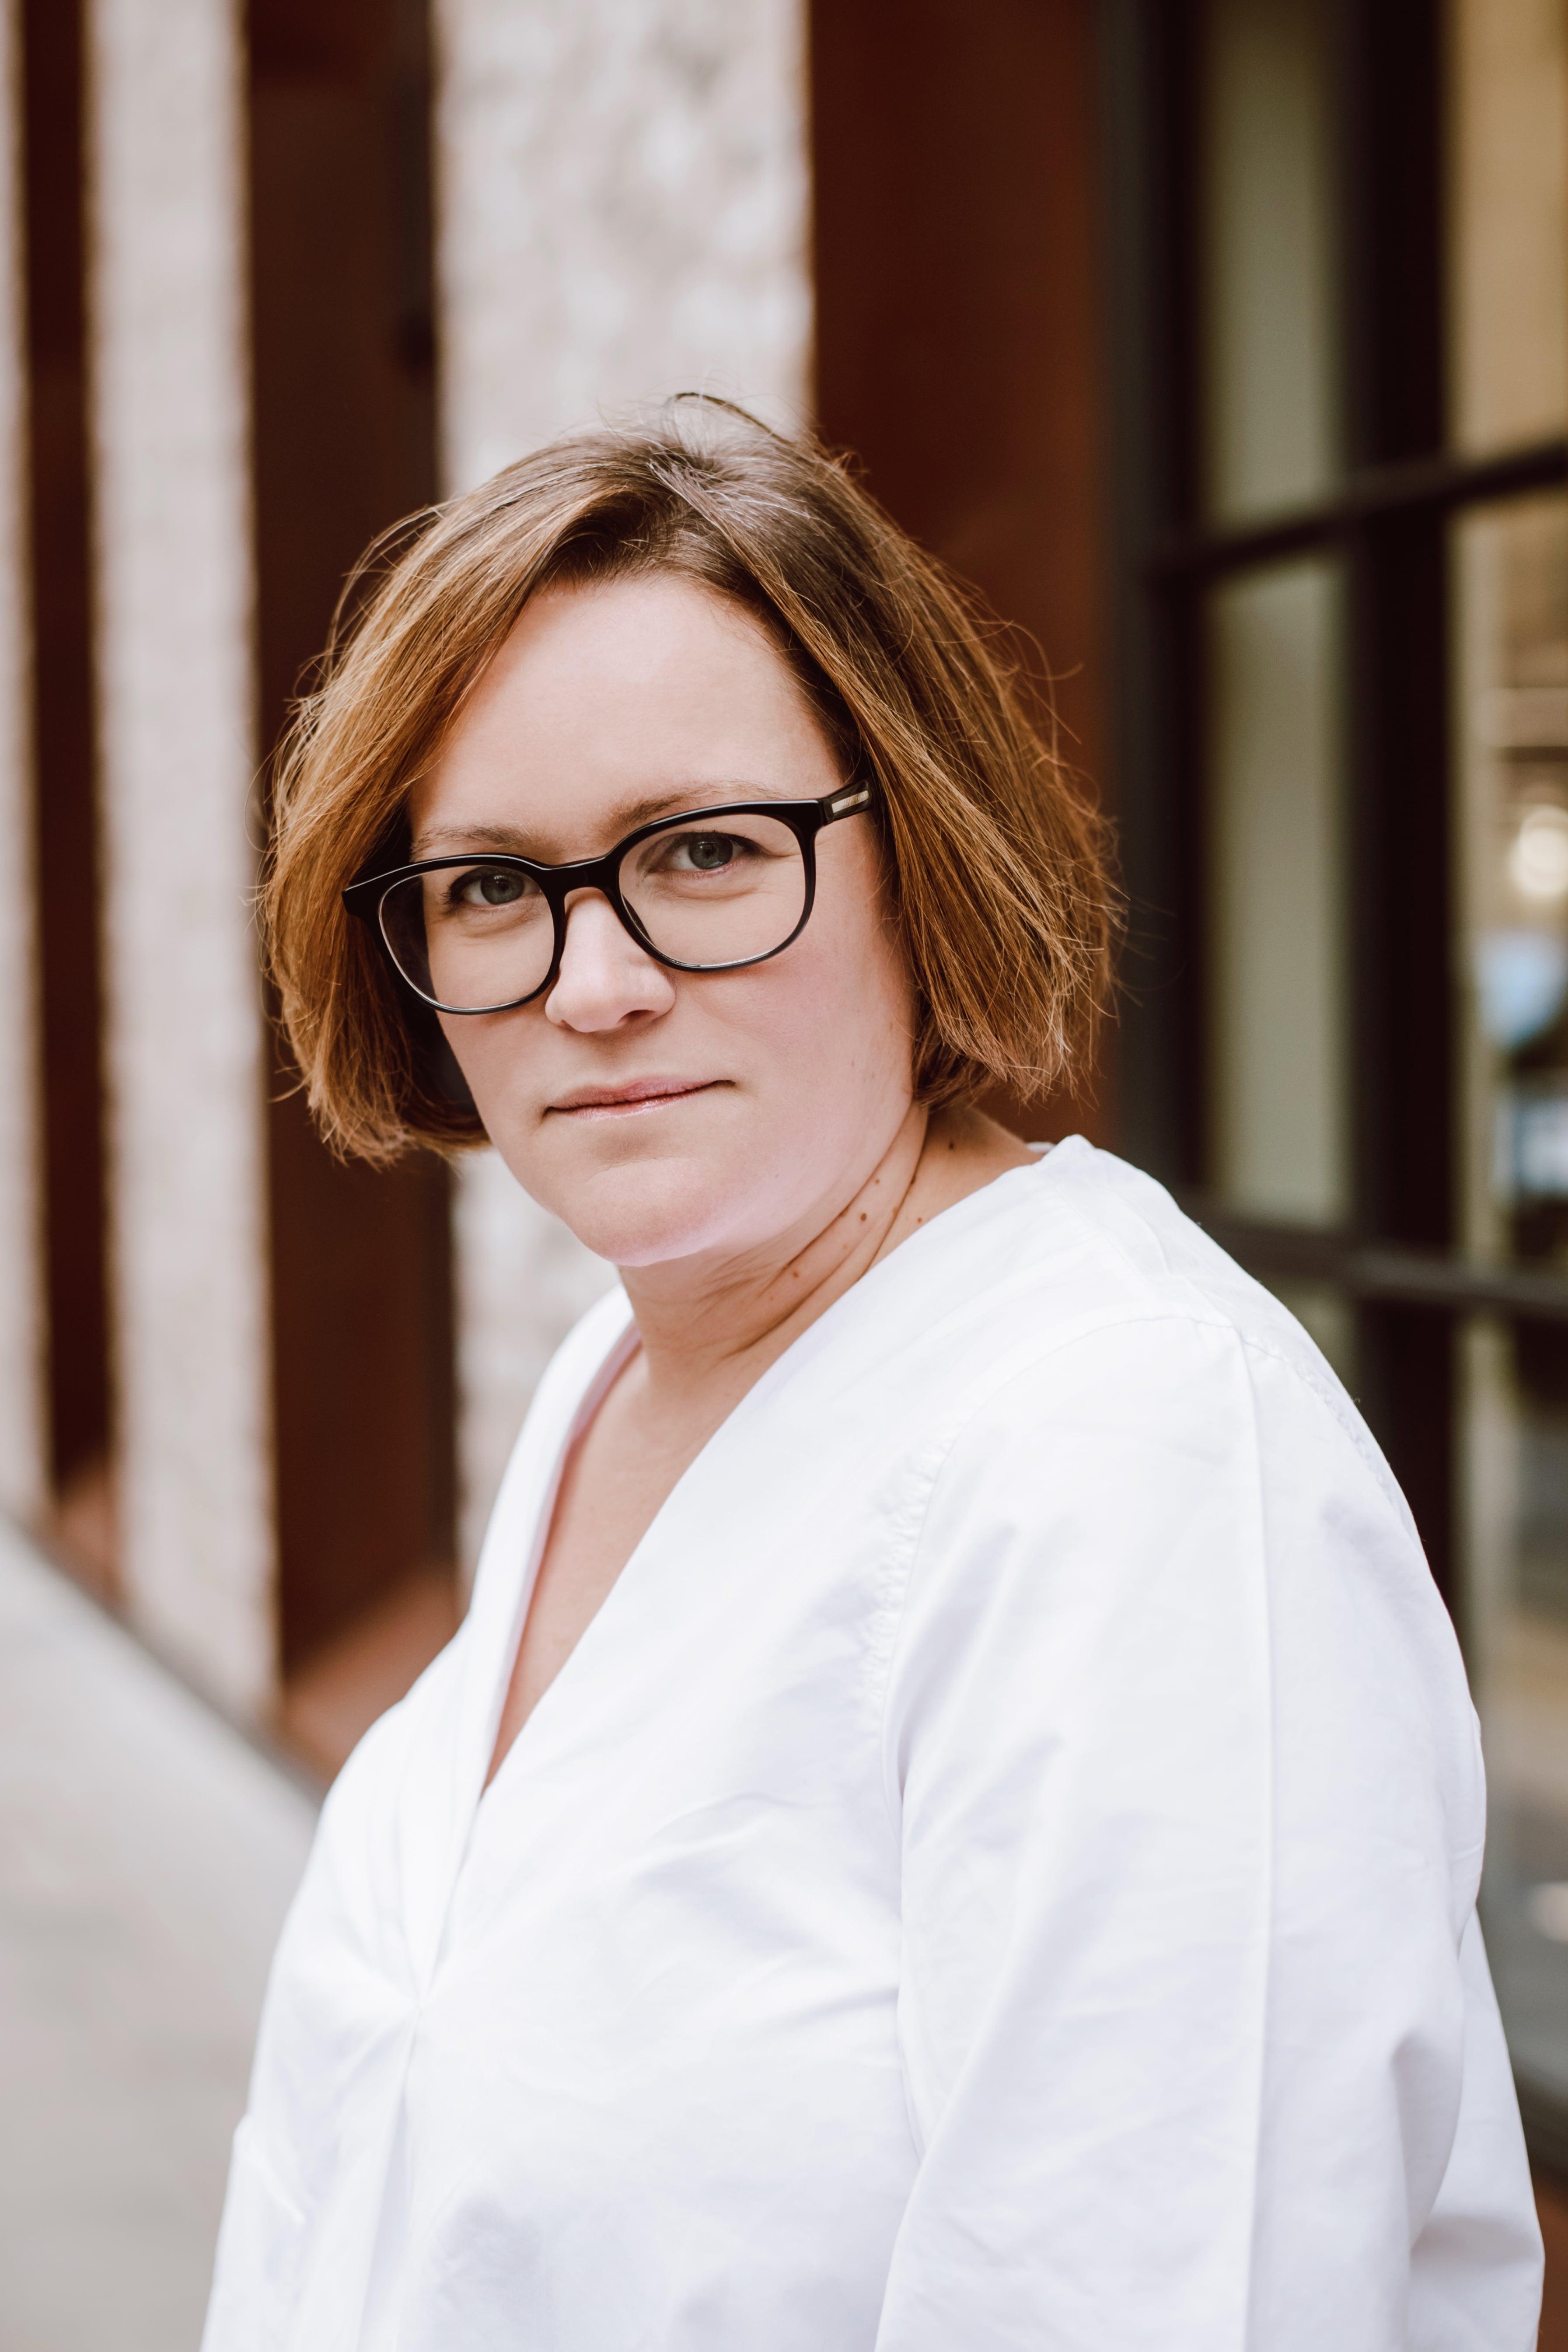 Victoria Lewis-Stephens, Managing Director at United Culture